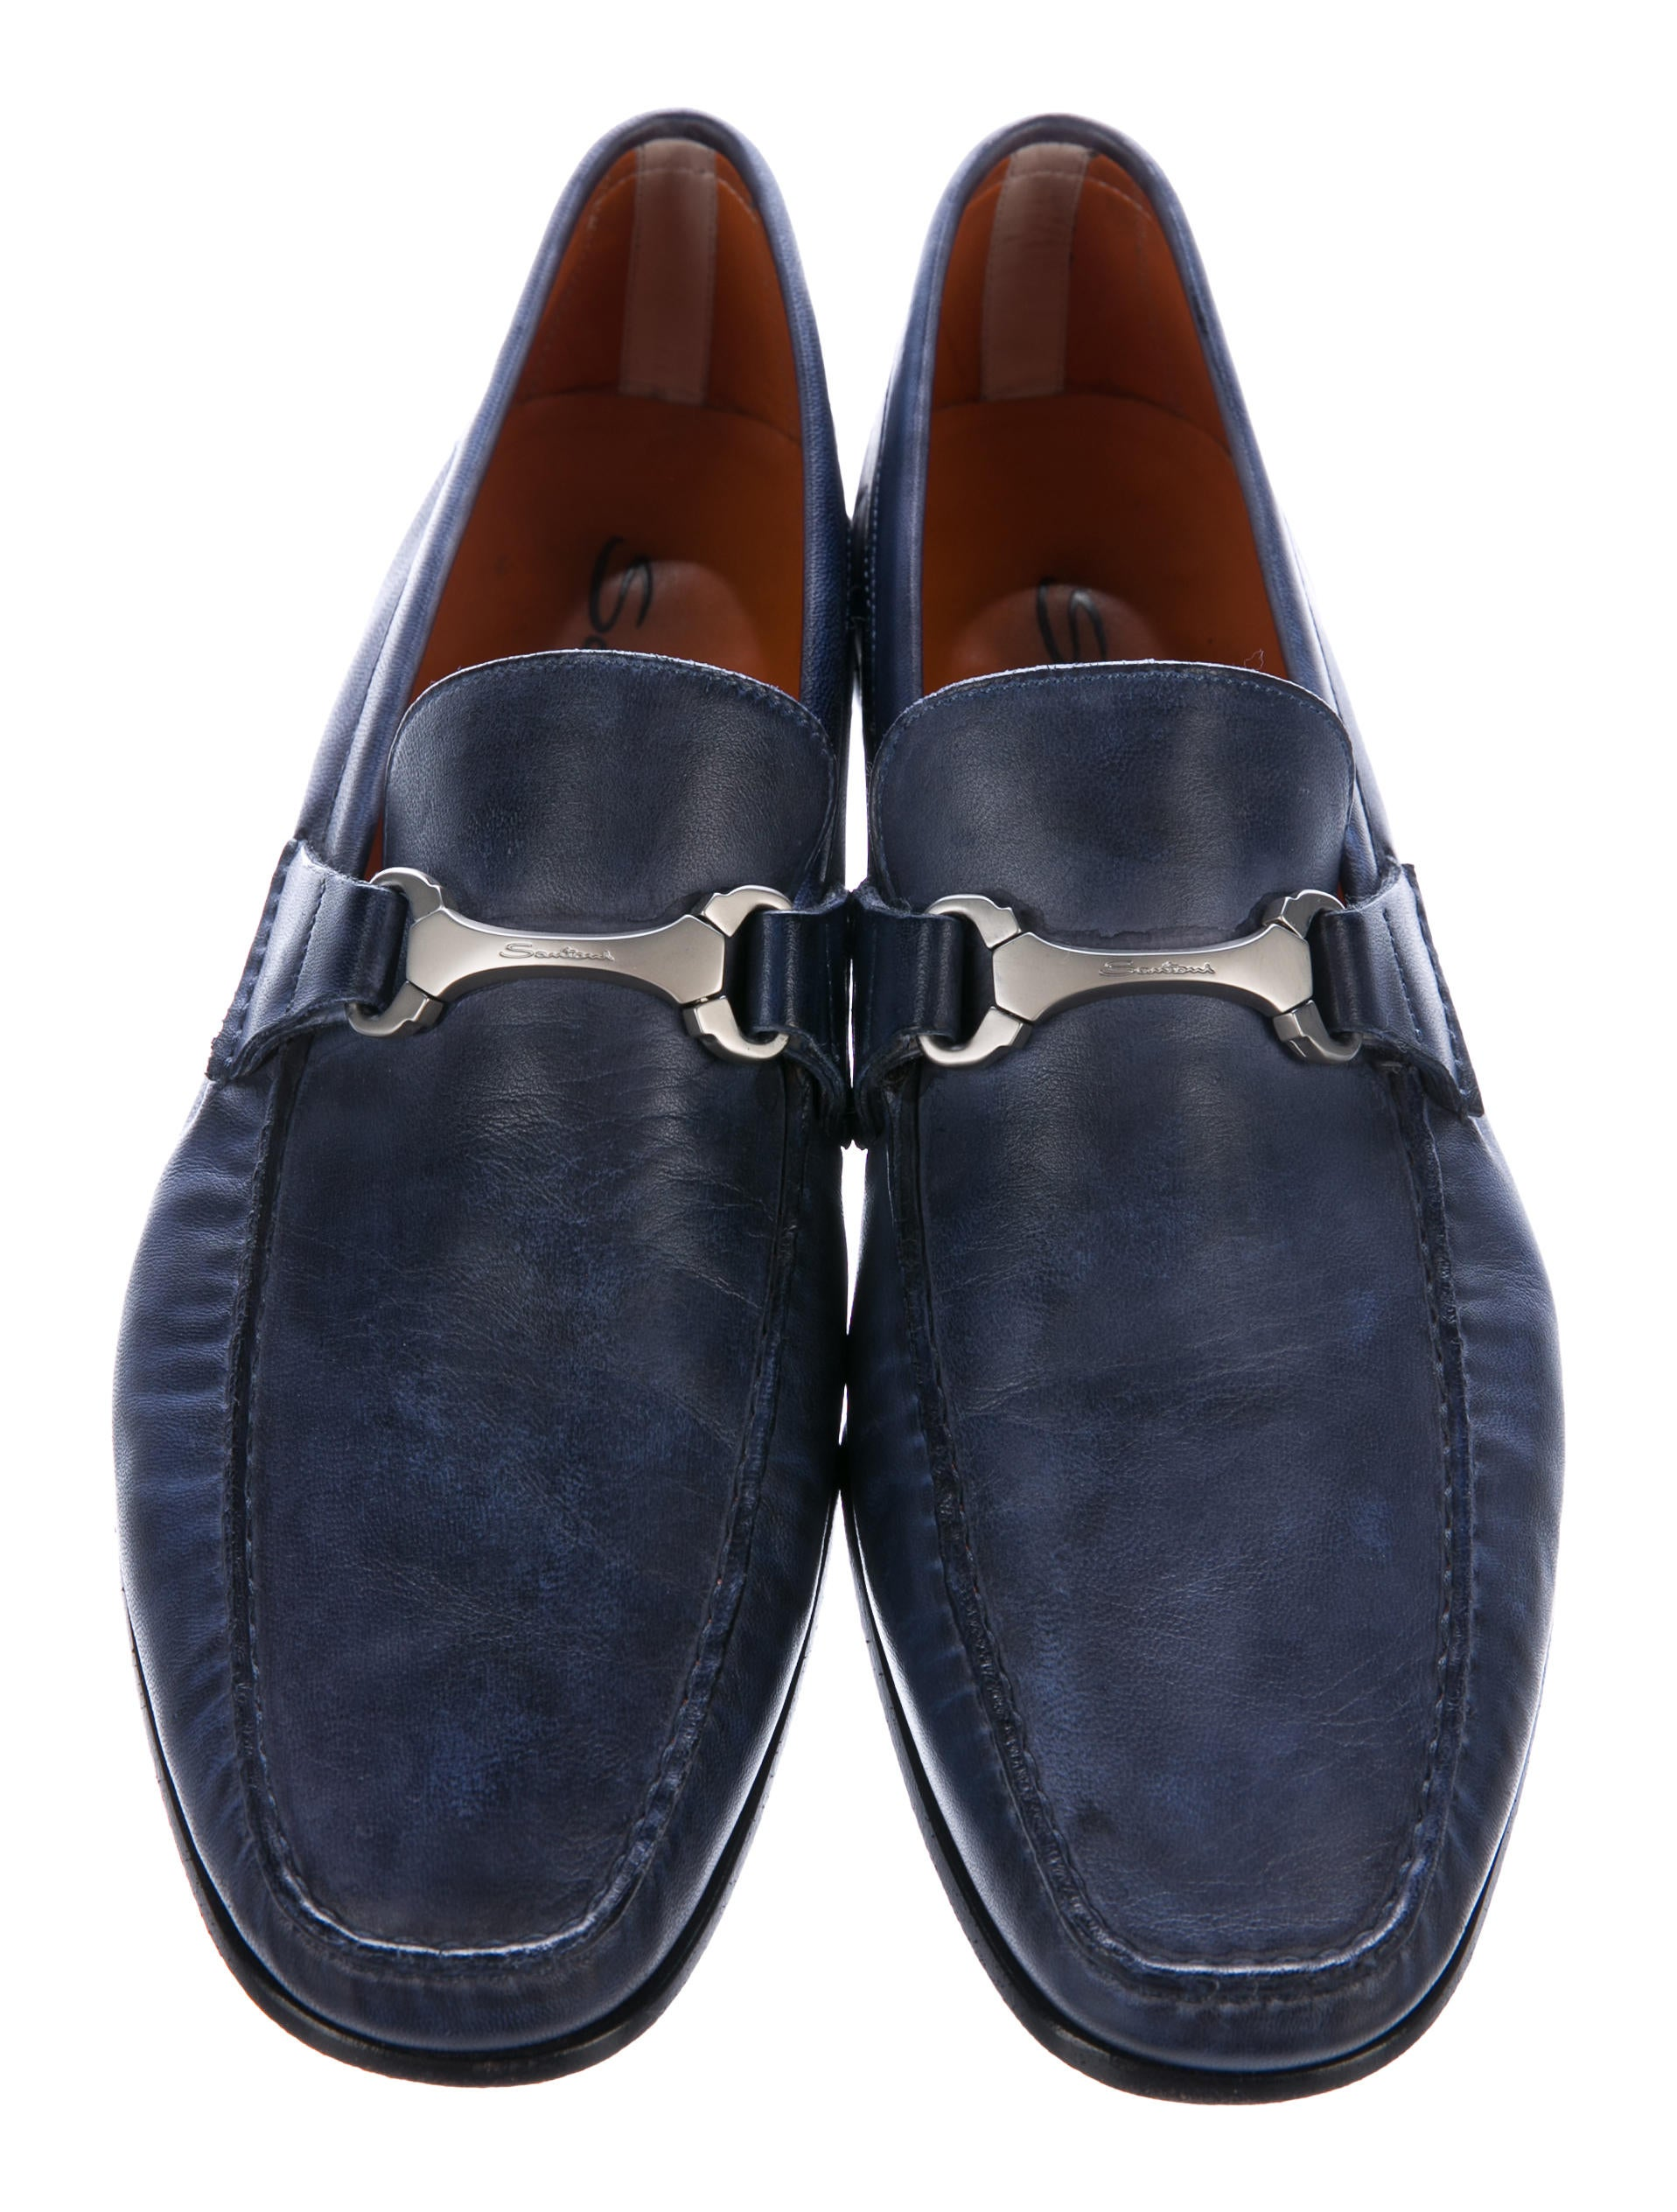 santoni leather dress loafers shoes sai20325 the